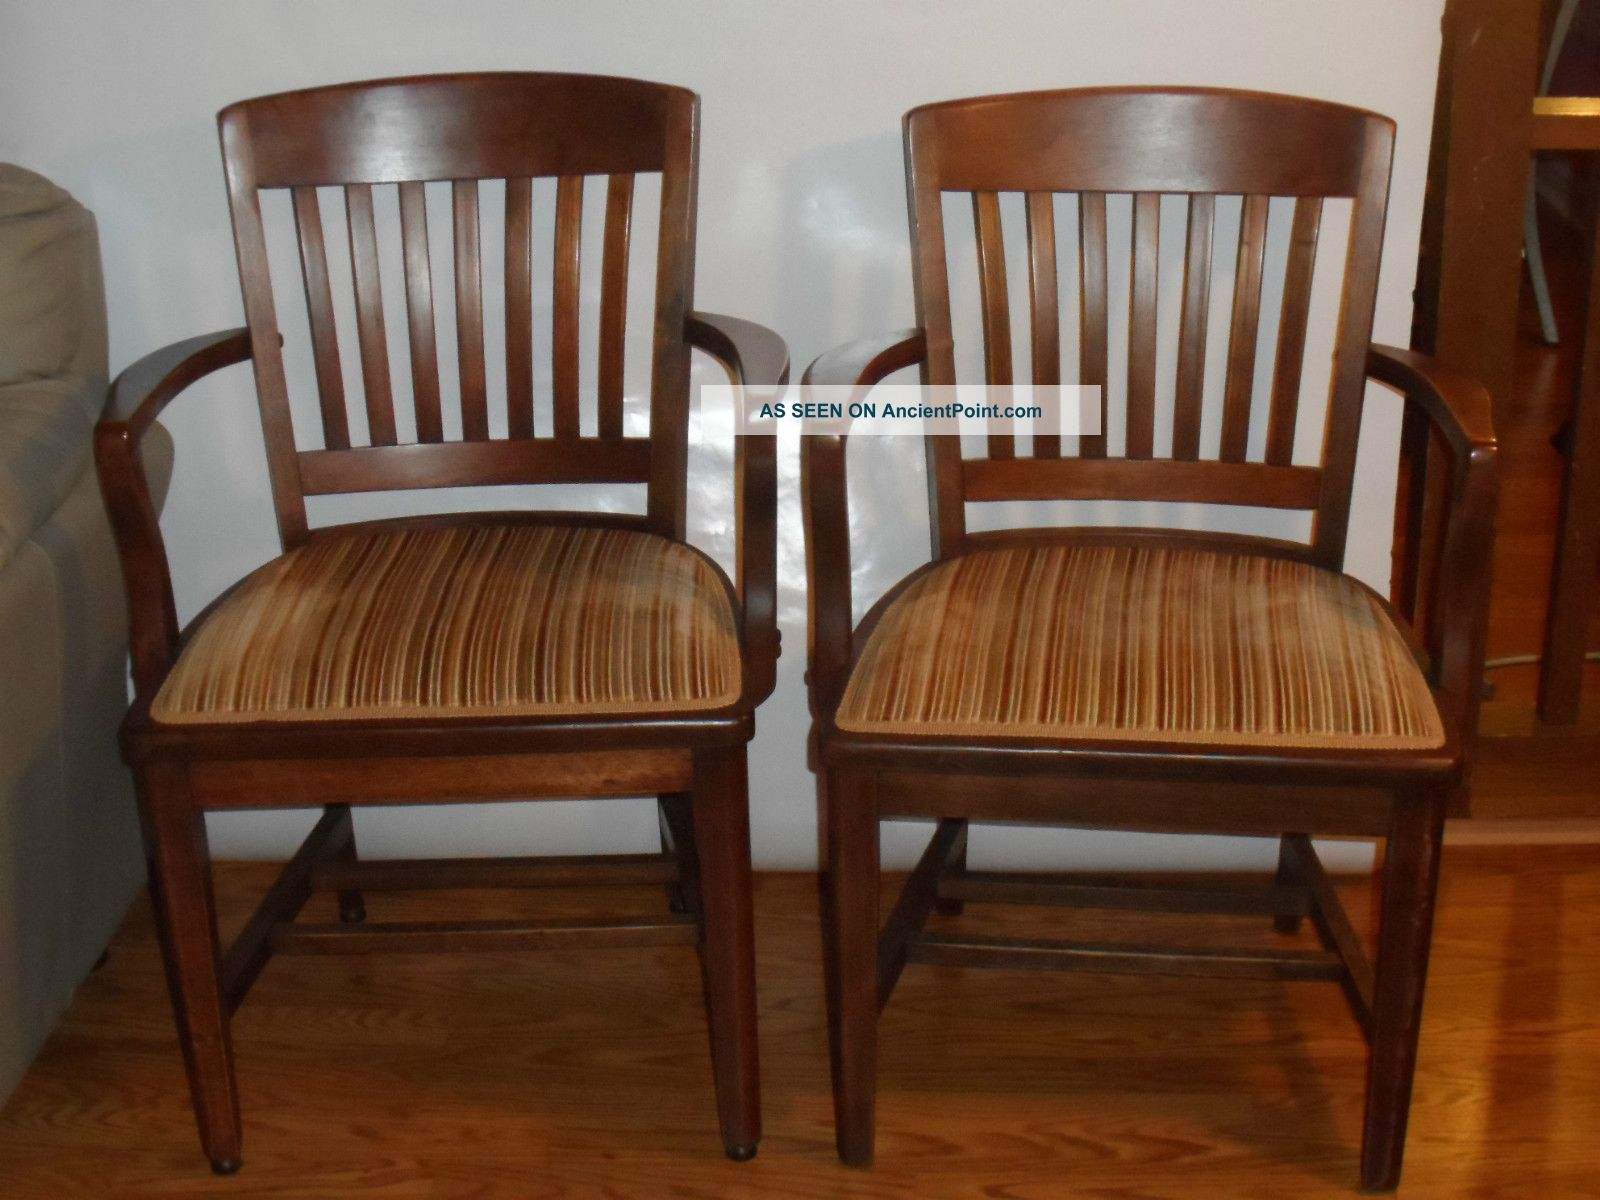 2 Vintage 1930s Walnut Wood Arm Chairs Charleston, Sc Bank ...